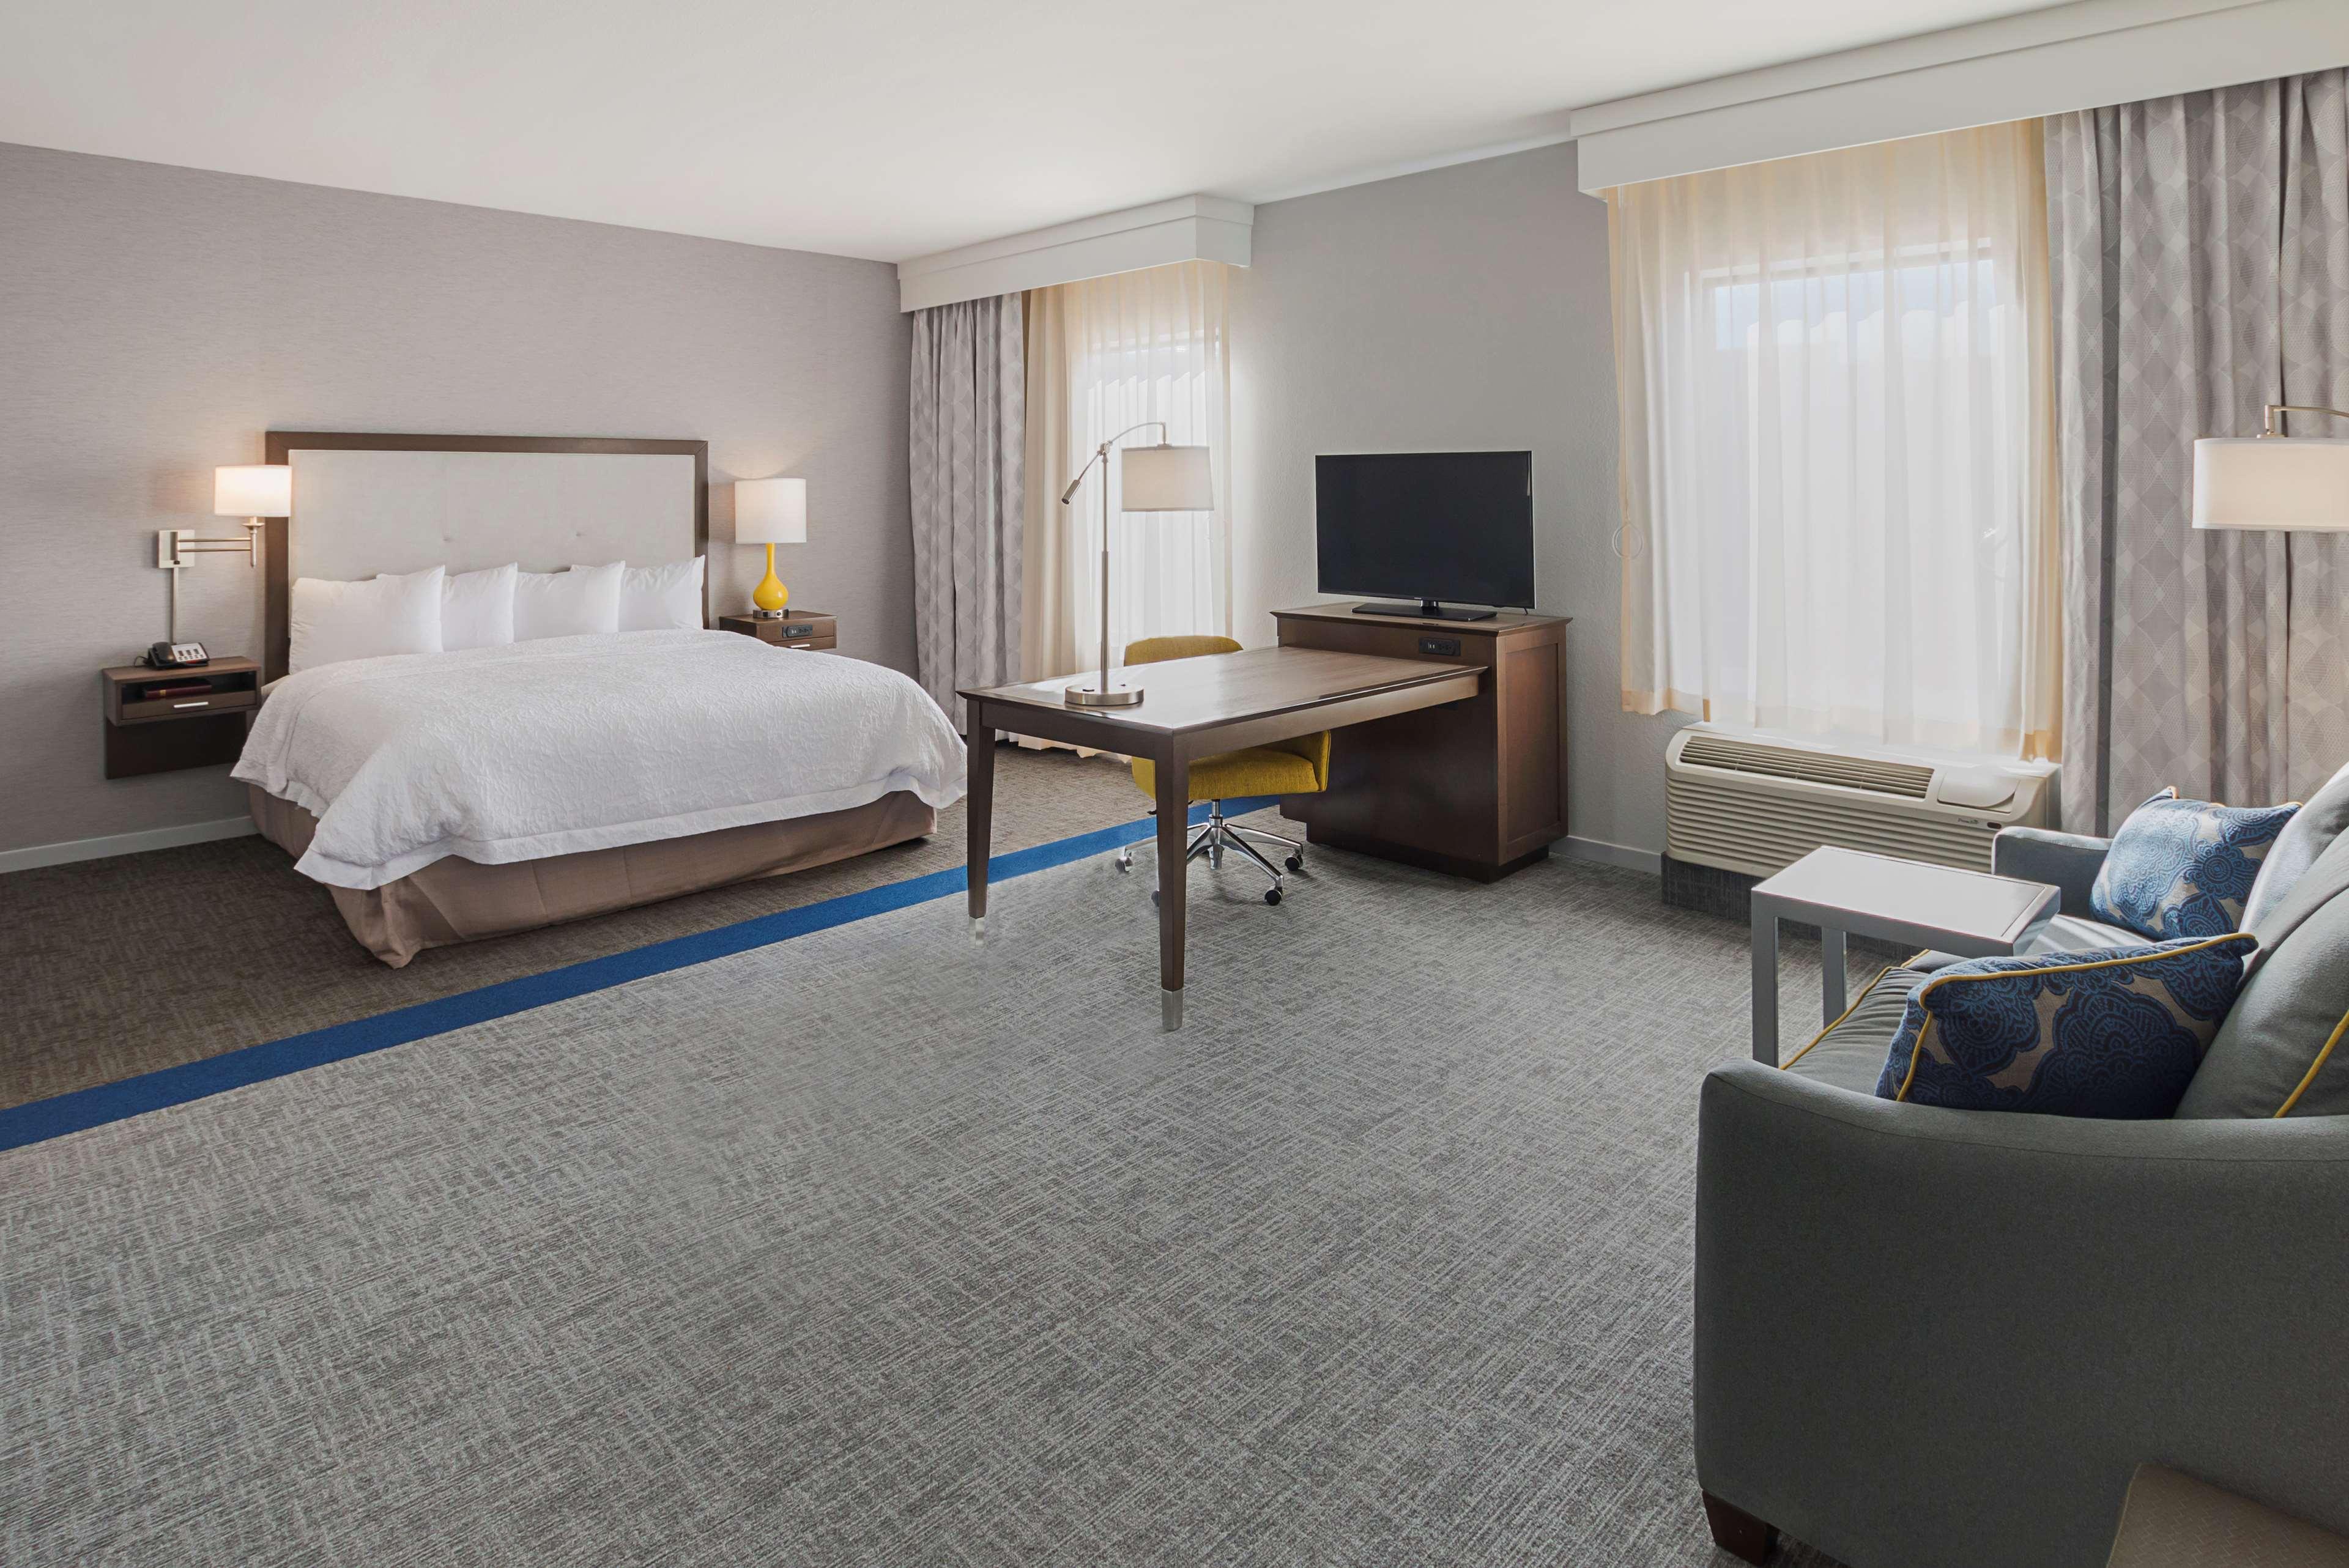 Hampton Inn & Suites Colleyville DFW West image 27